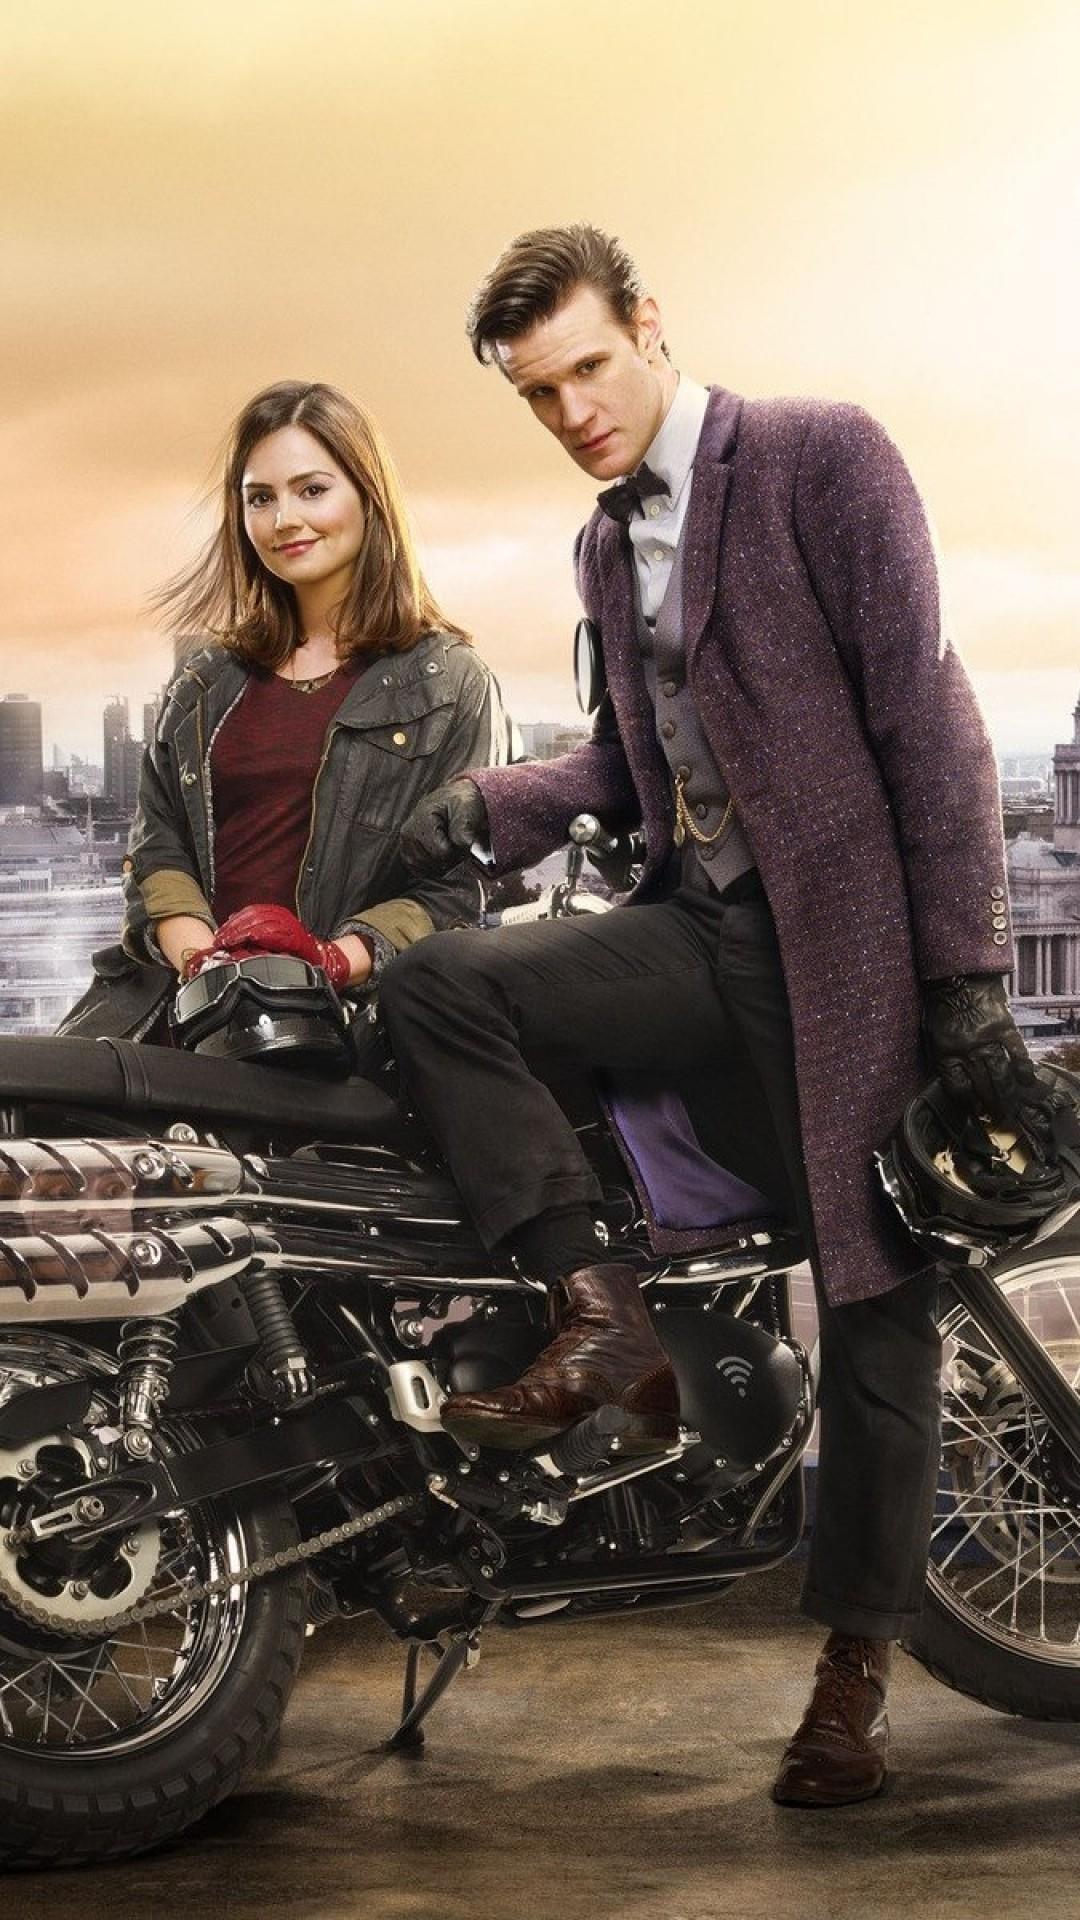 Wallpaper doctor who, matt smith, jenna-louise coleman,  motorcycle, london